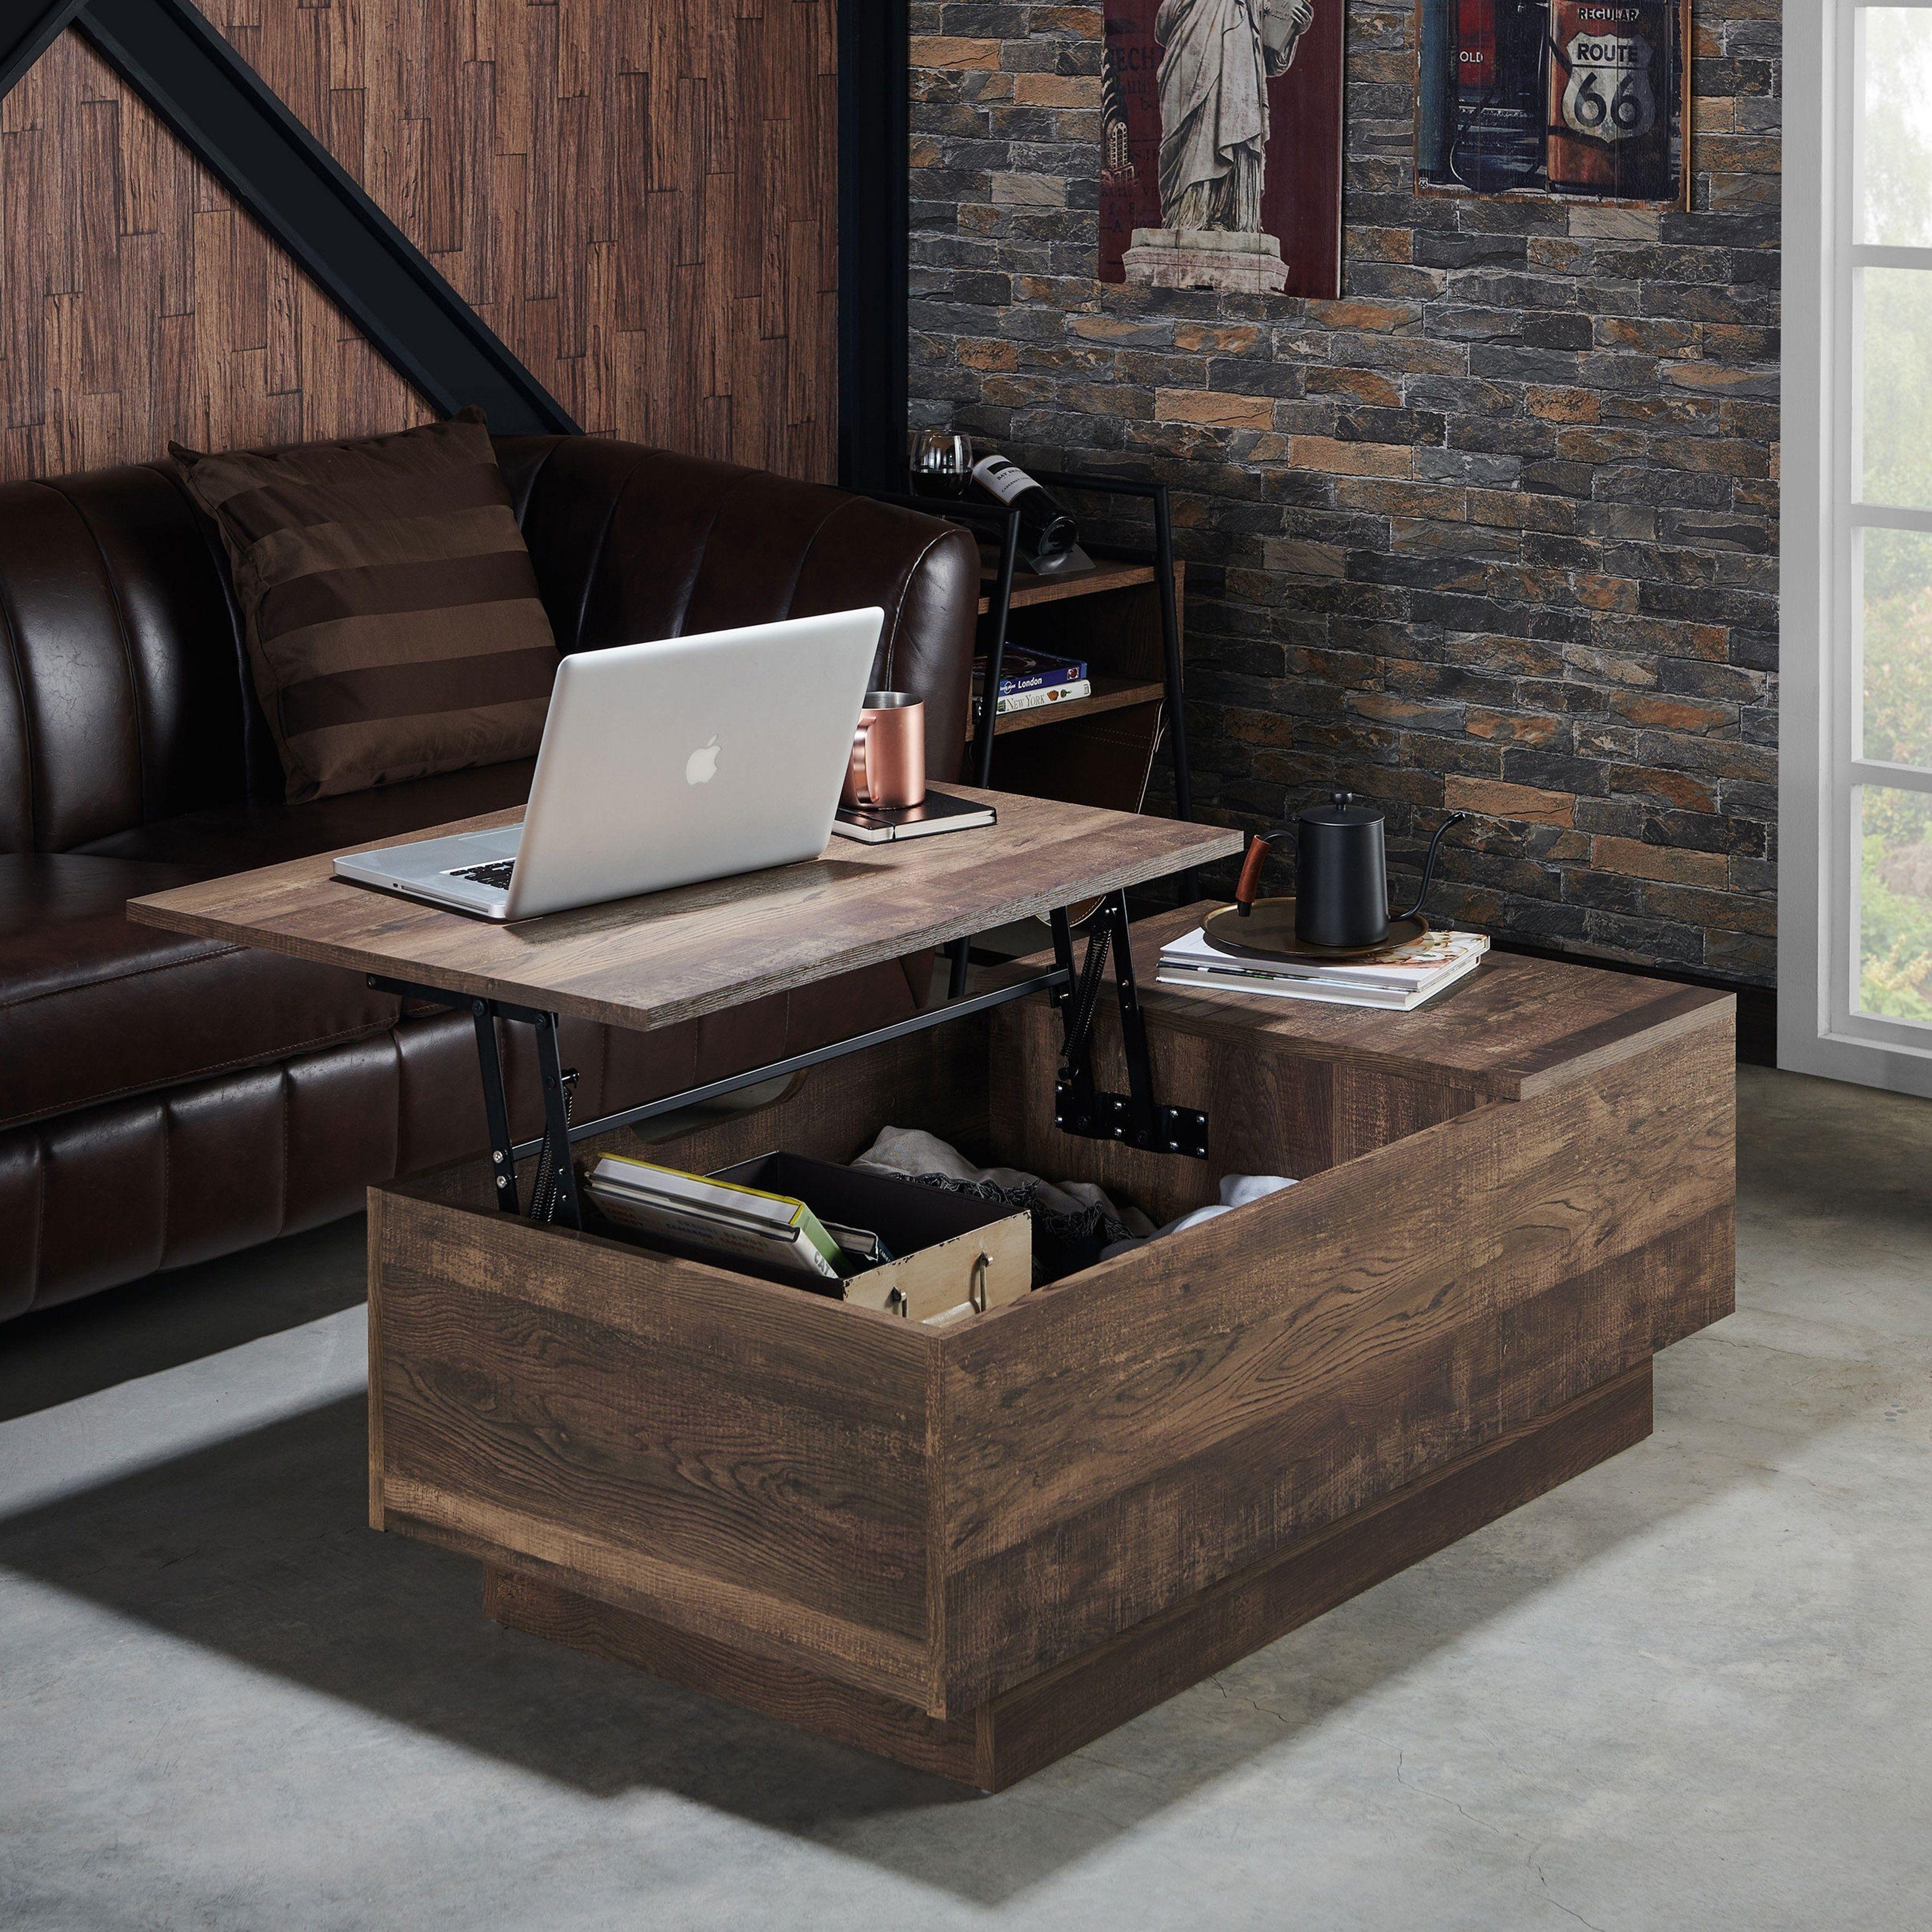 Furniture Of America Hernan Distressed Lift Top Coffee Table Brown Coffee Table Furniture Furniture Of America [ 3500 x 3500 Pixel ]